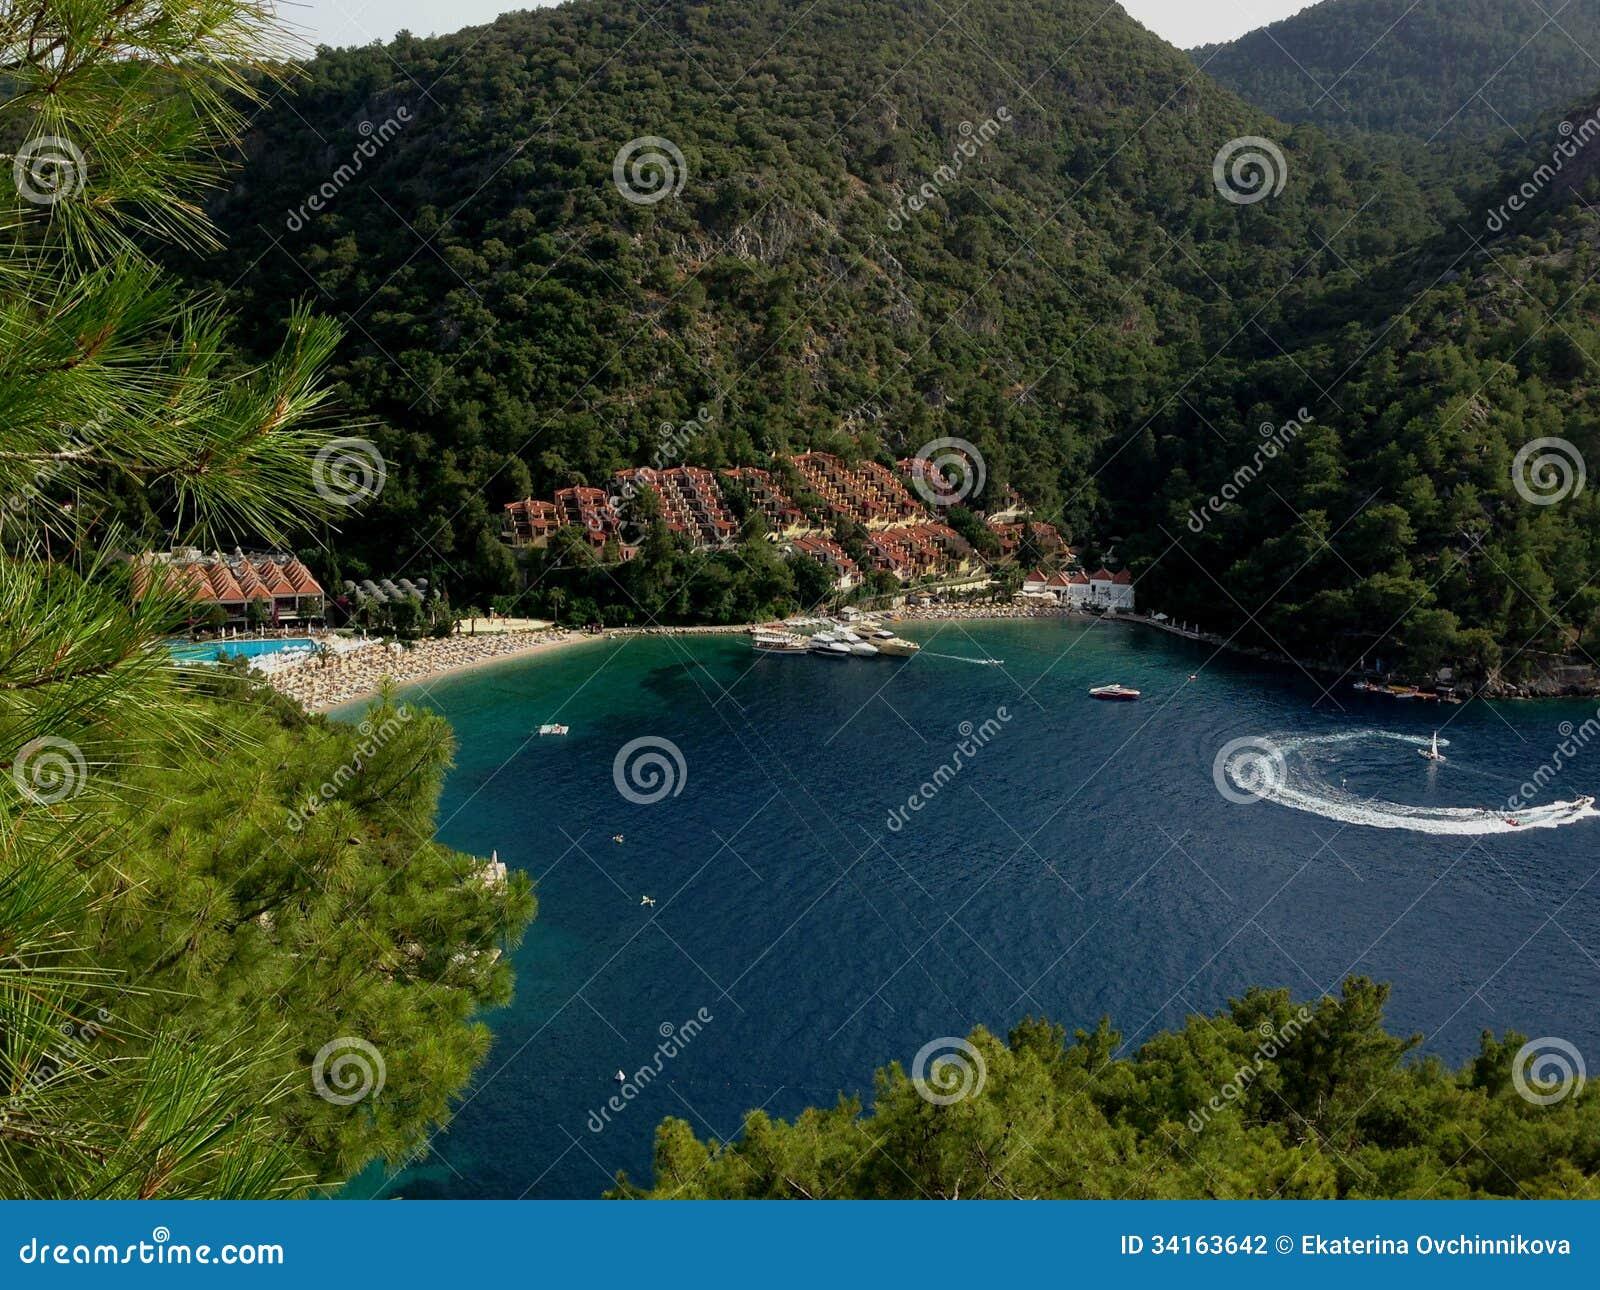 A turkish hotel stock photo  Image of resort, beach, service - 34163642